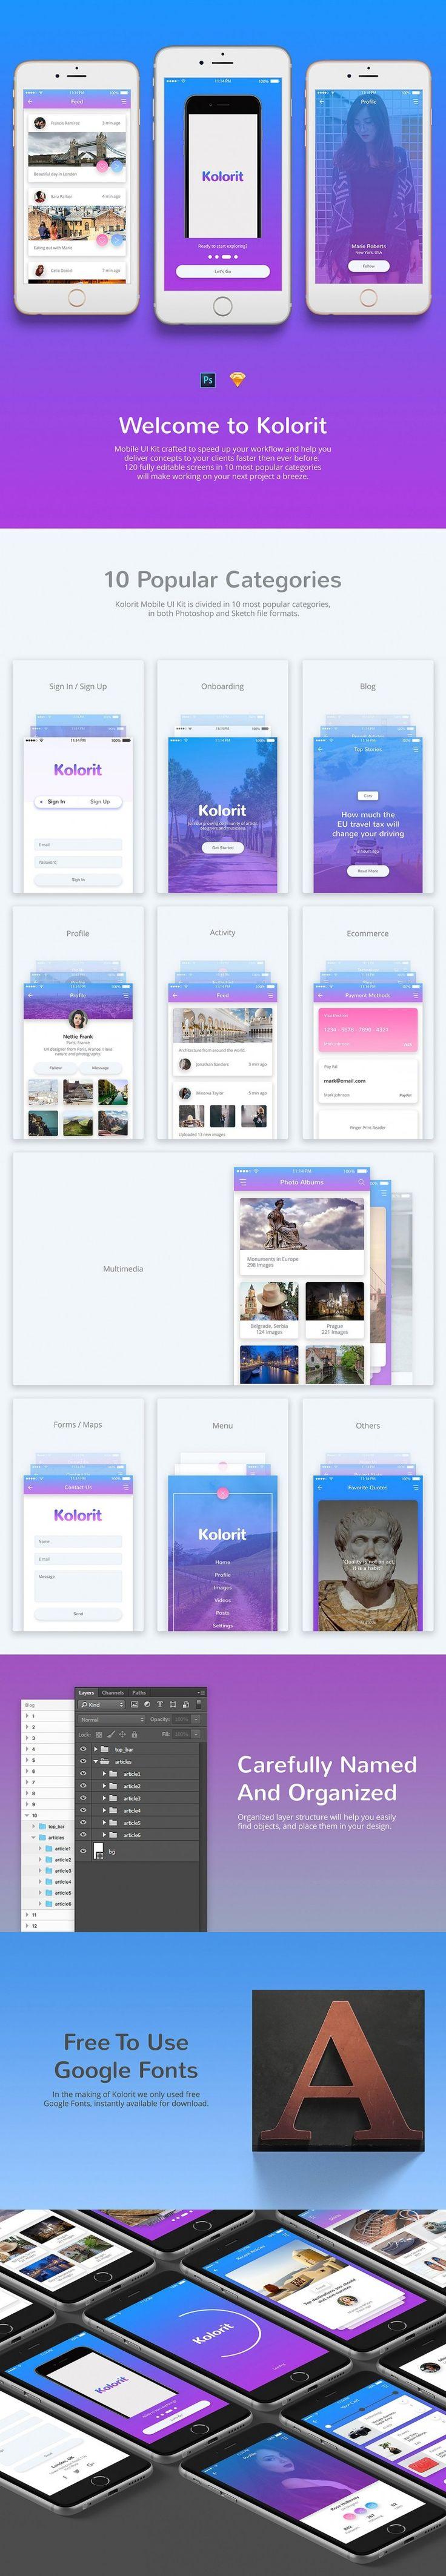 Kolorit Mobile UI Kit